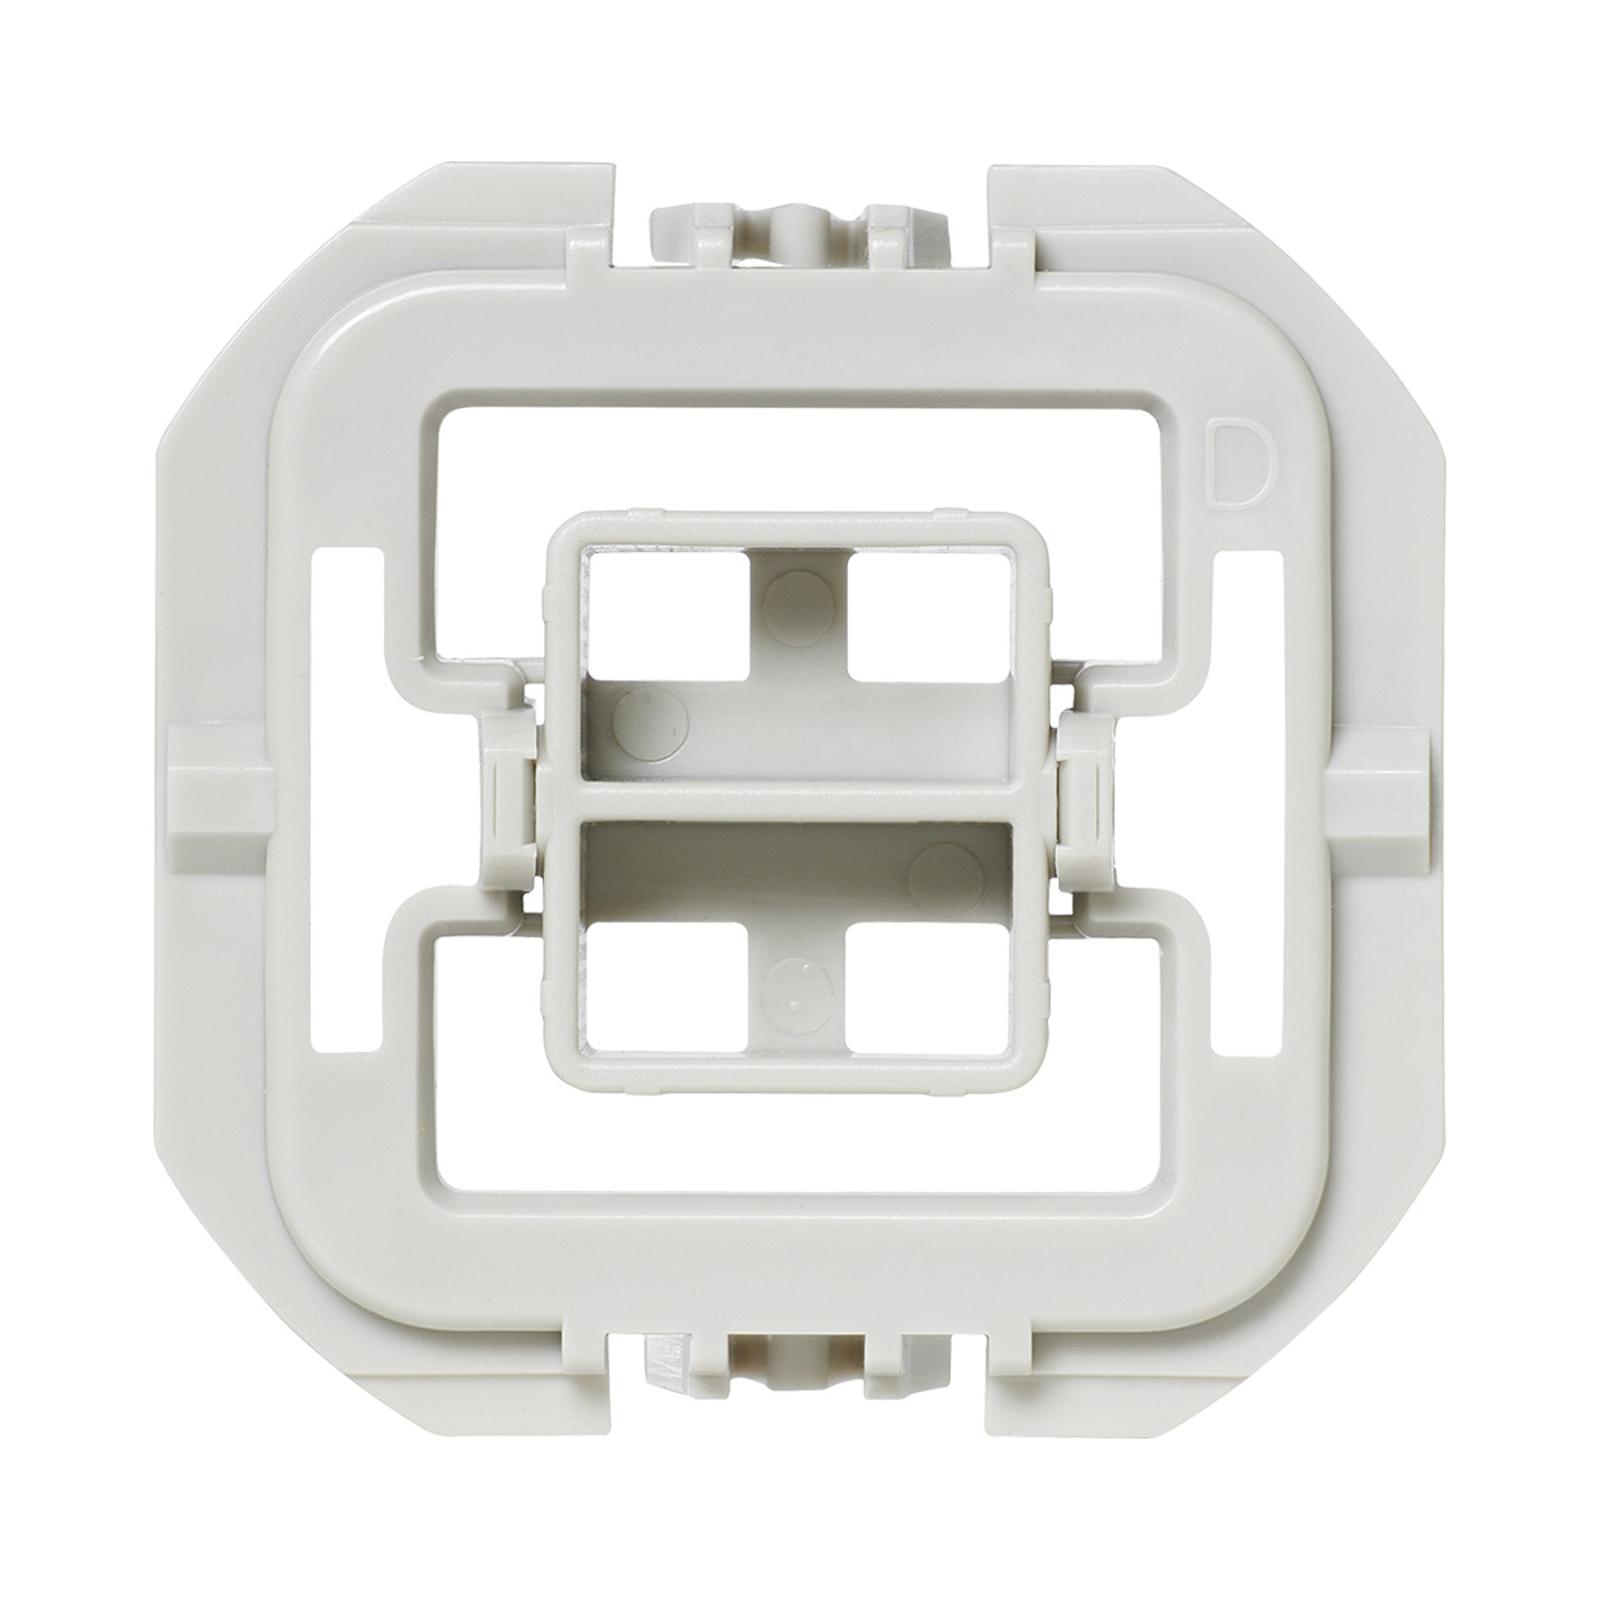 Homematic IP-adapter for Düwi/REV Ritter 20x